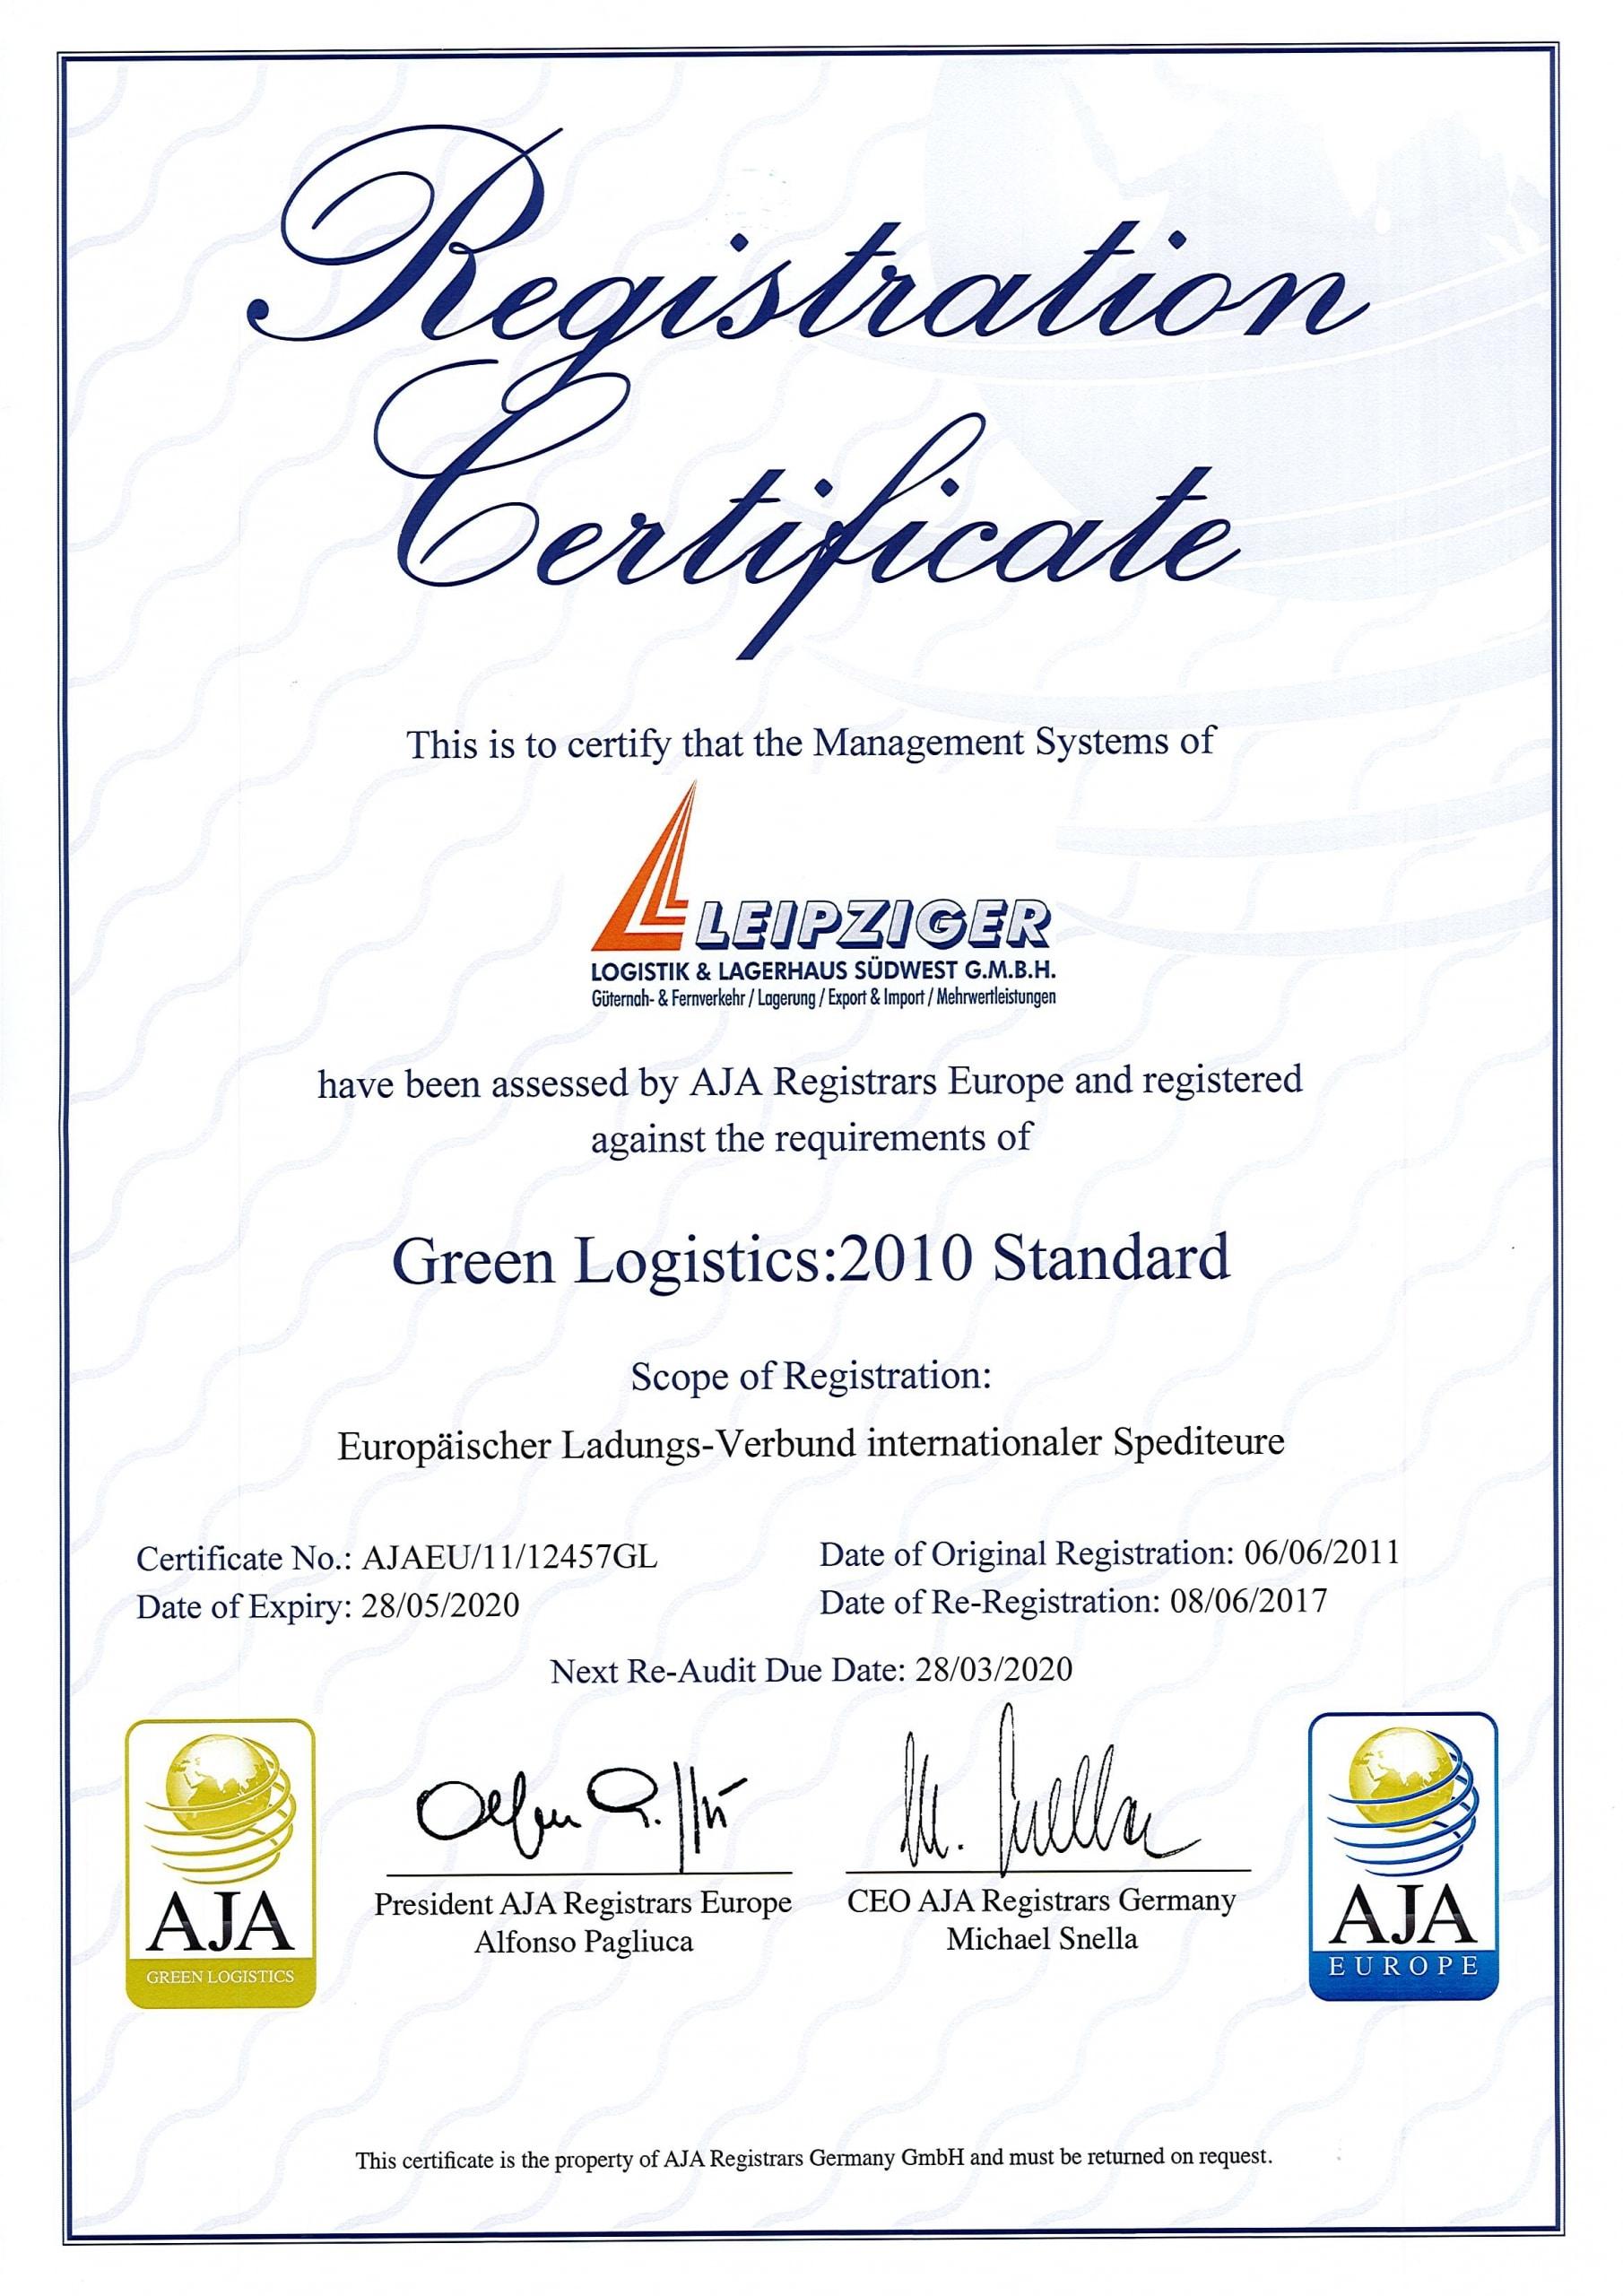 Green Logistics 2010 Standard